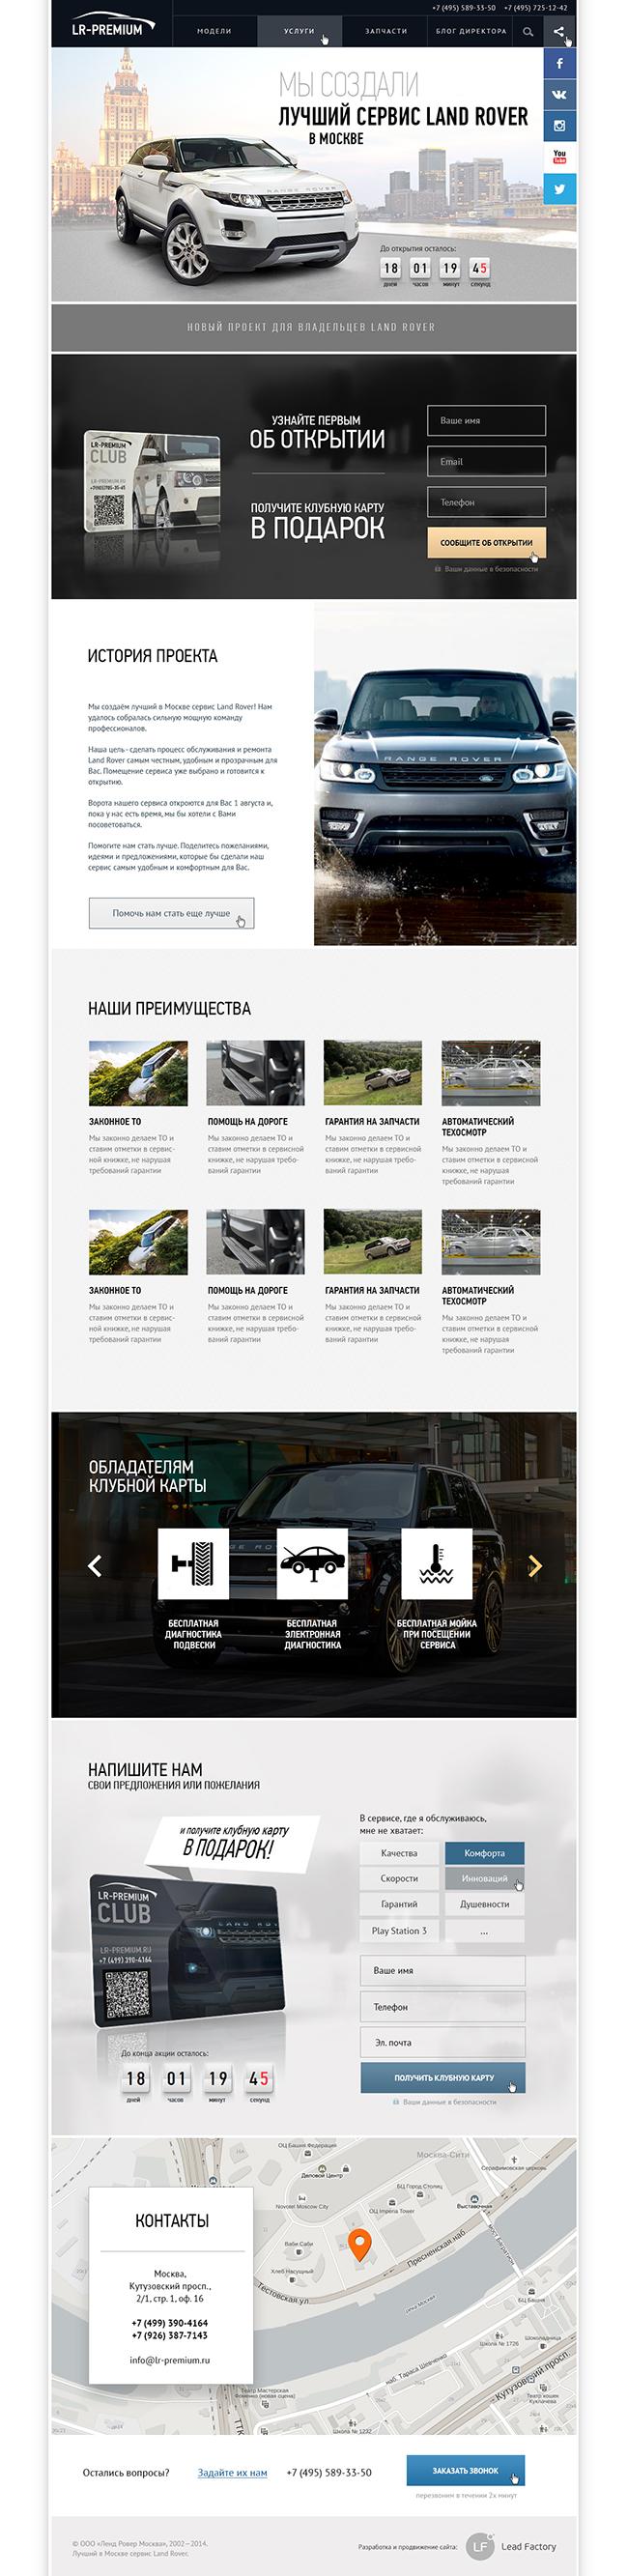 Multi Landing Page Сервиса Lend Rover